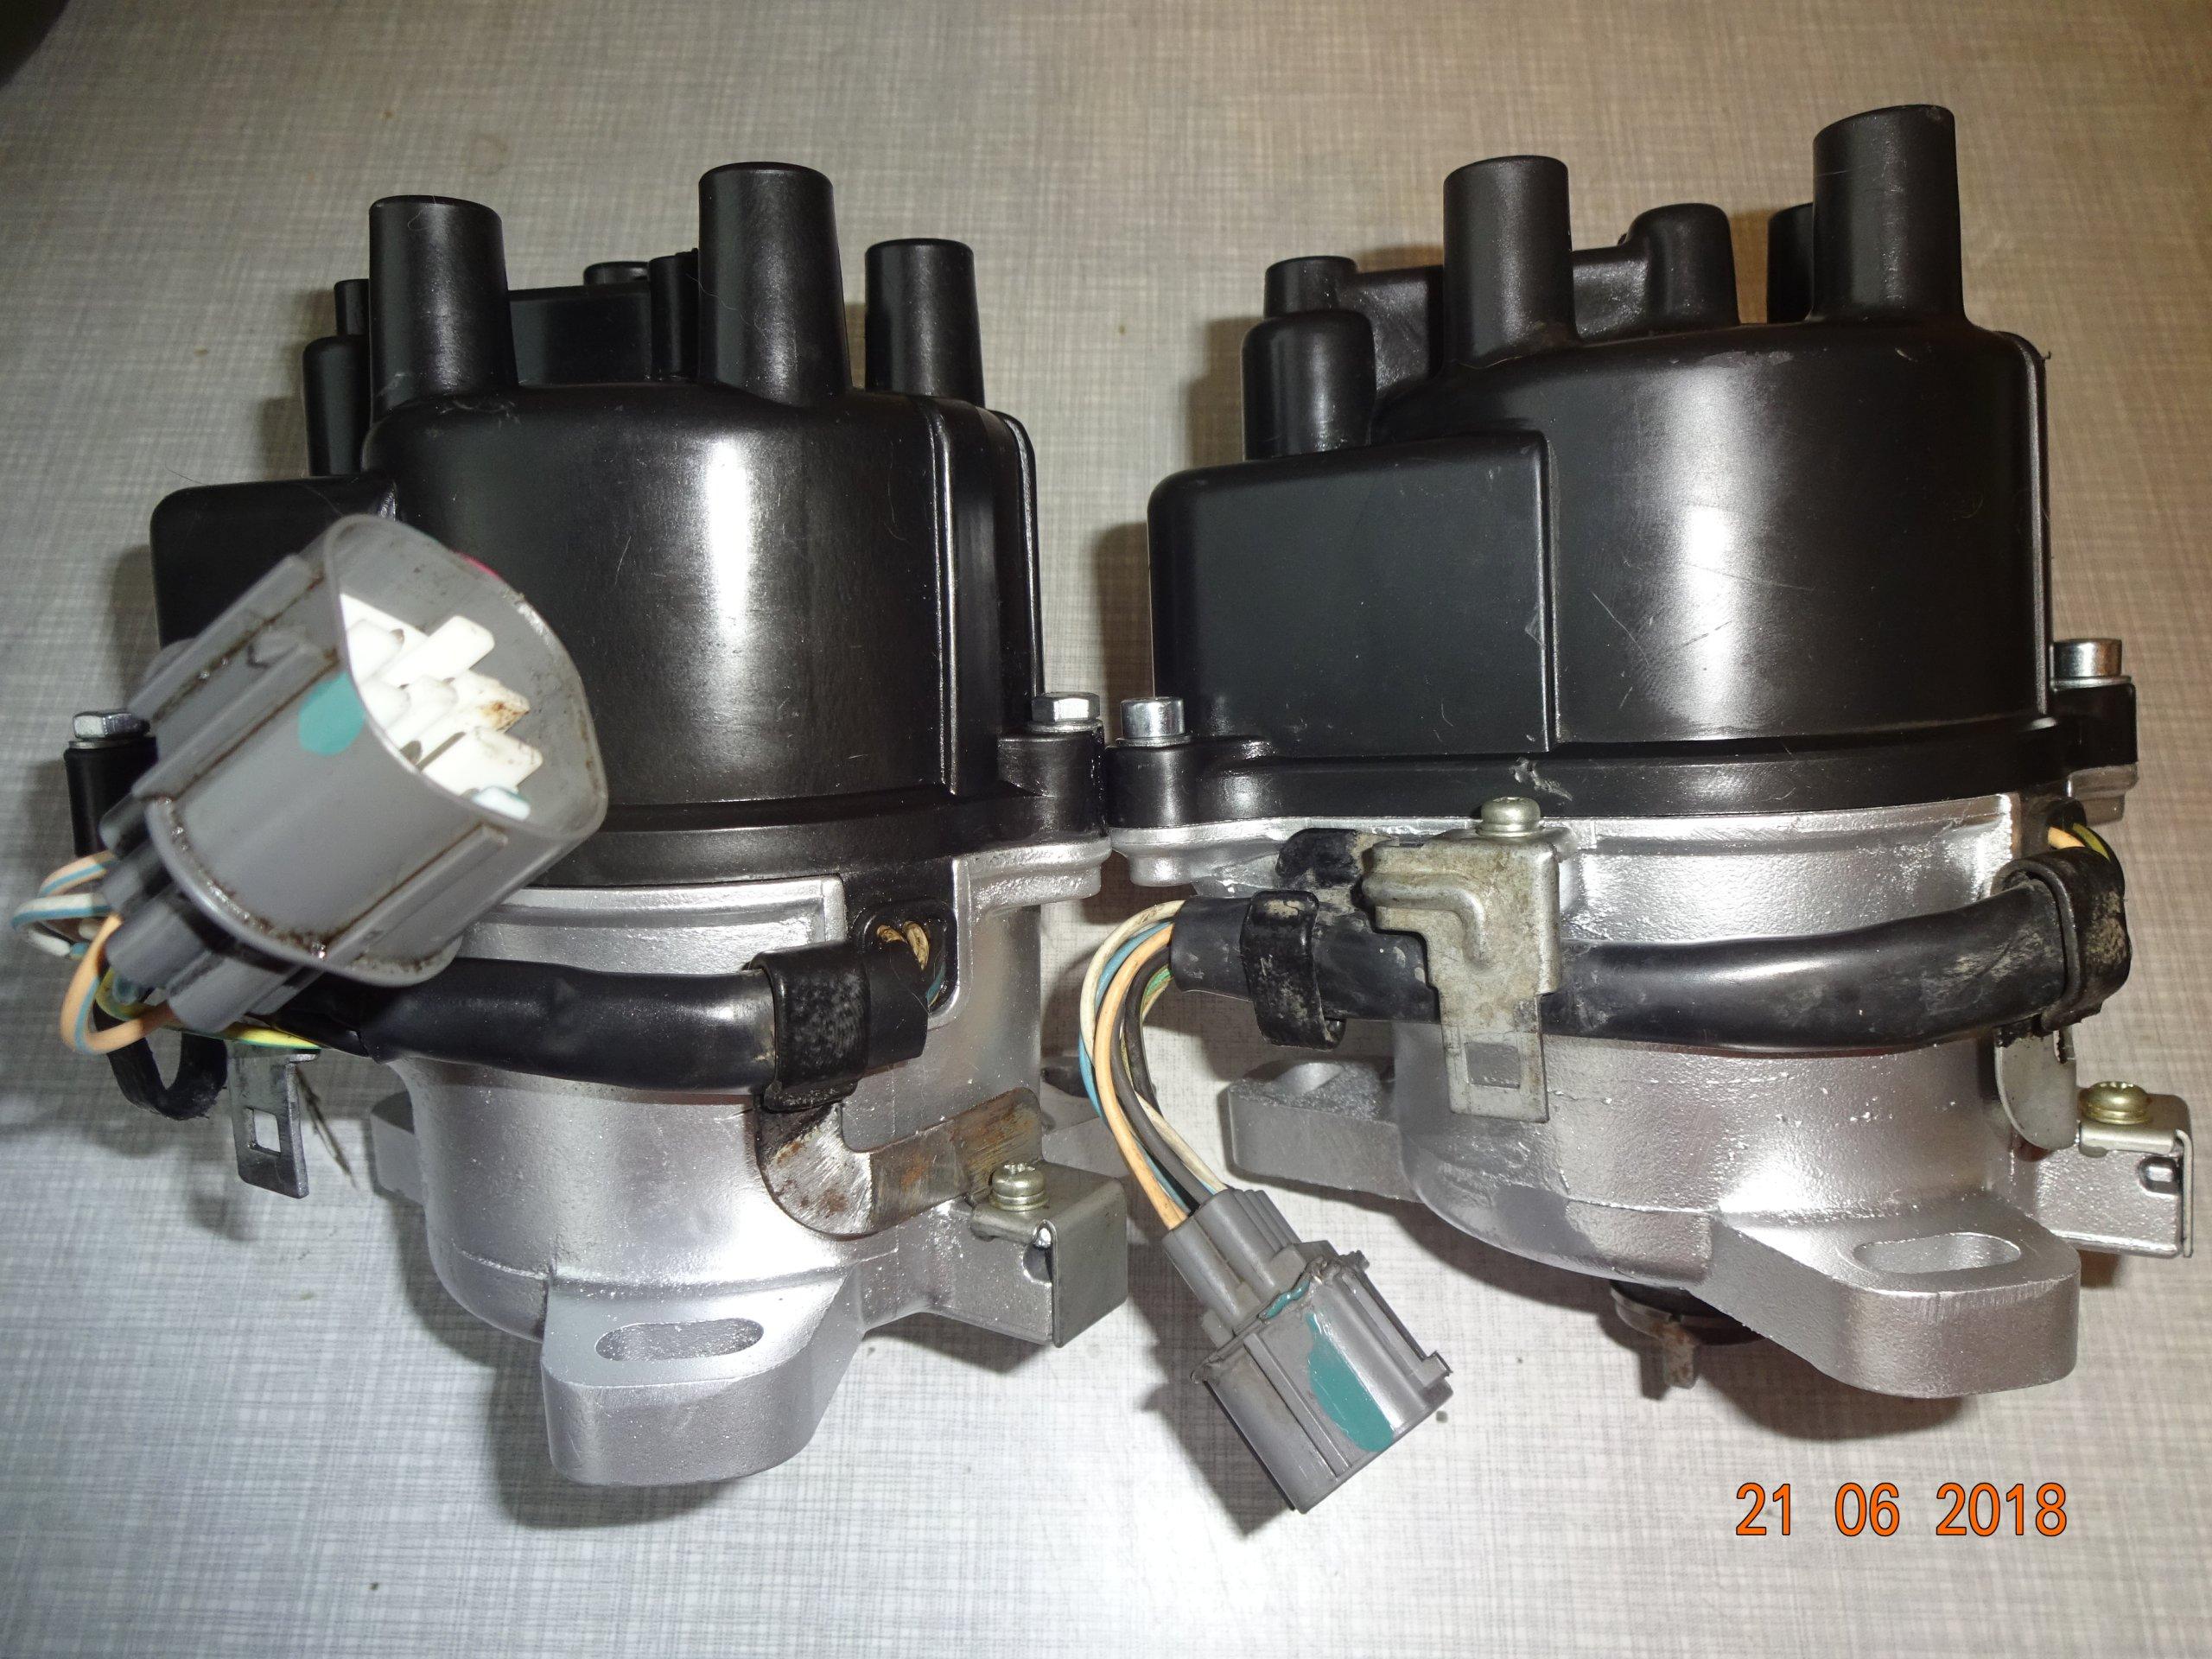 камера зажигания honda crv 20 8-9pin 3lata гарантирует